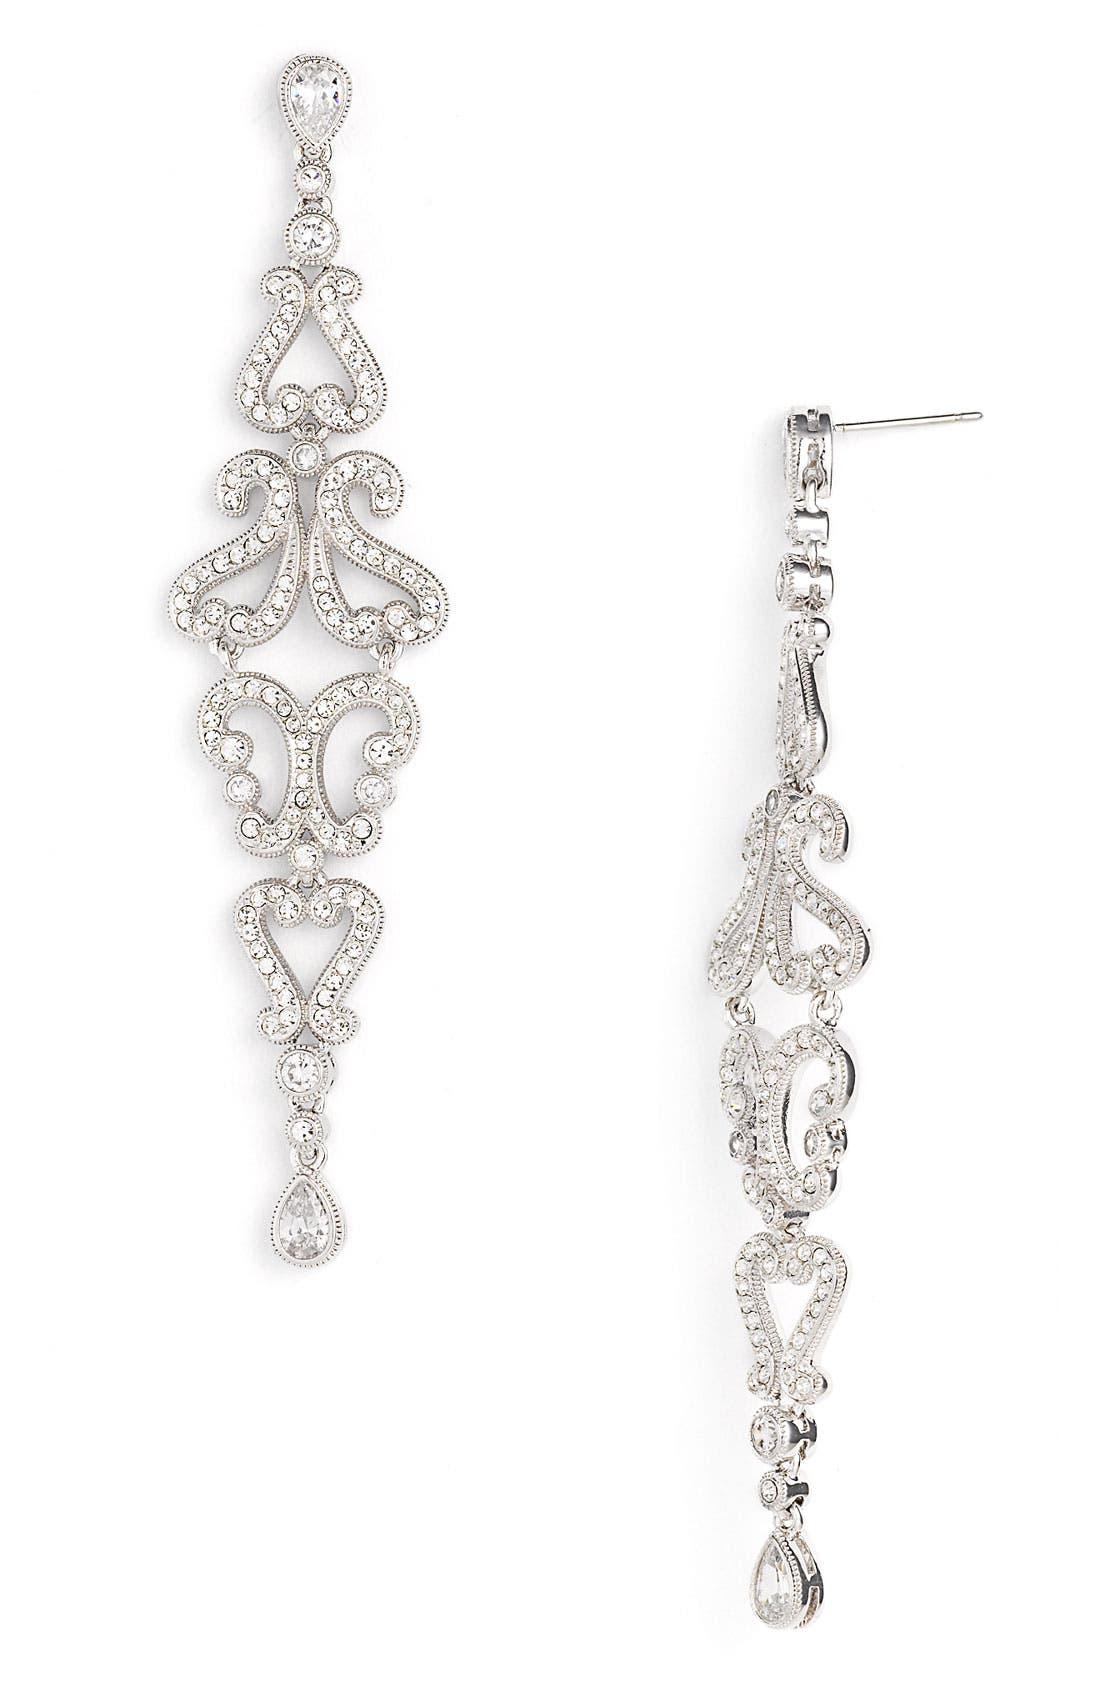 Alternate Image 1 Selected - Nadri Linear Filigree Earrings (Nordstrom Exclusive)